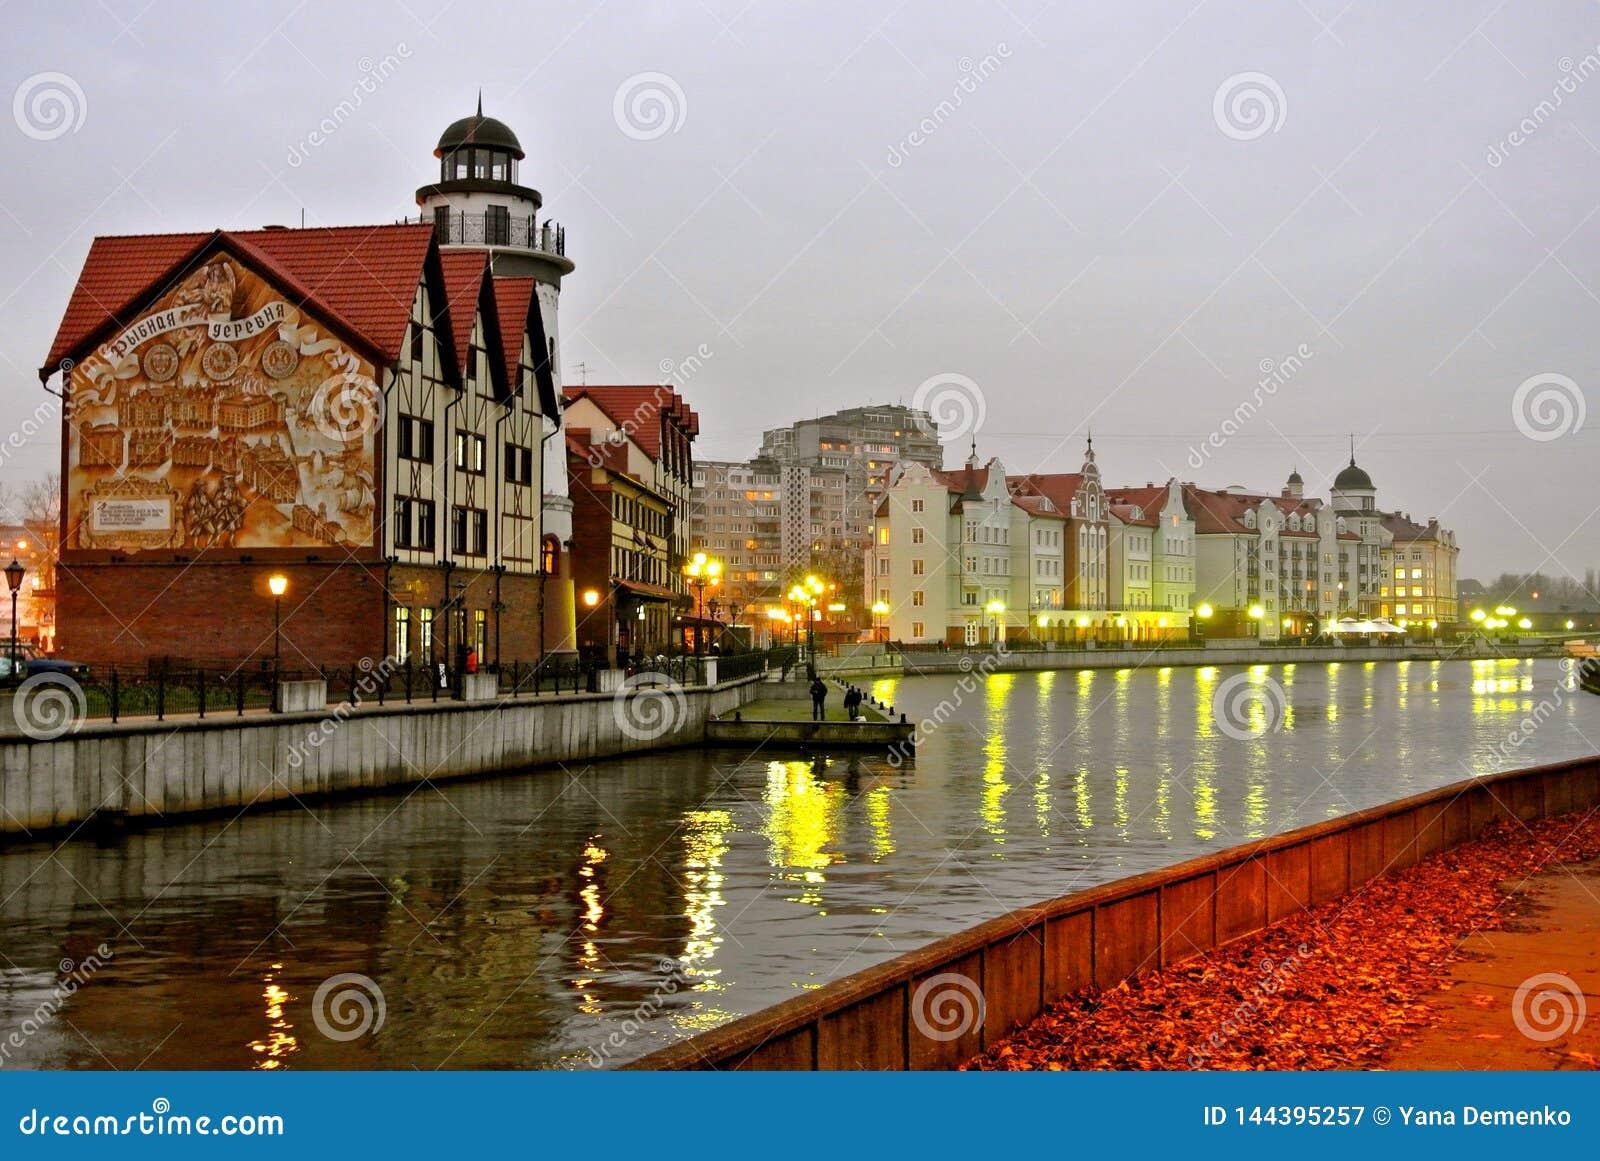 Avondmening van de dijk van Kaliningrad city's